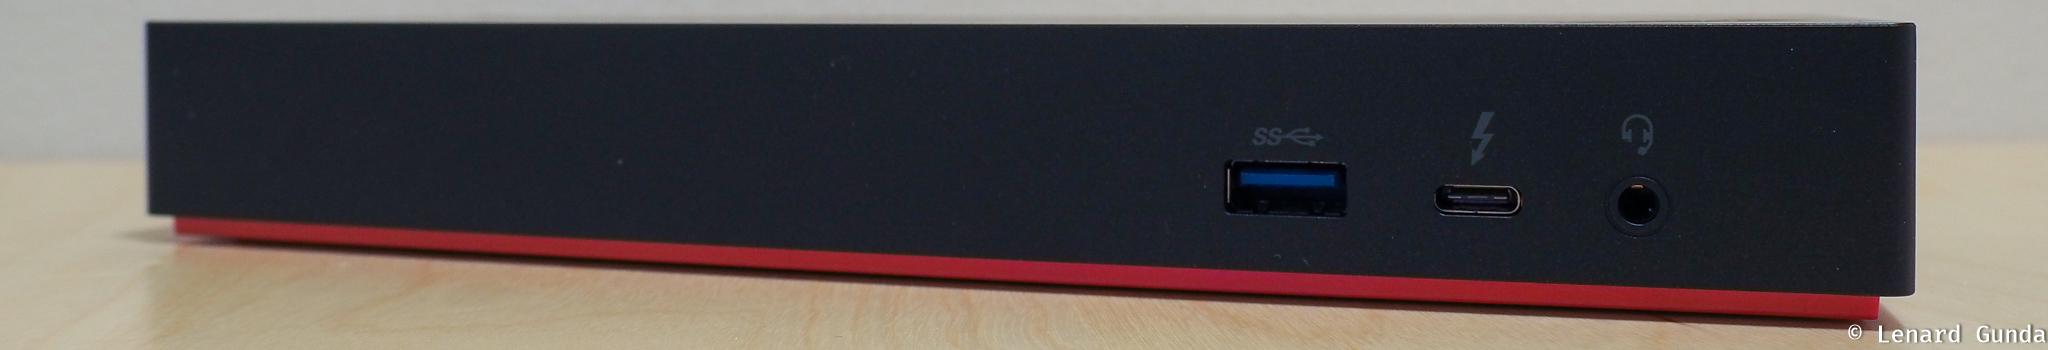 ThinkPad Thunderbolt 3 Workstation Dock review - LenardGunda com